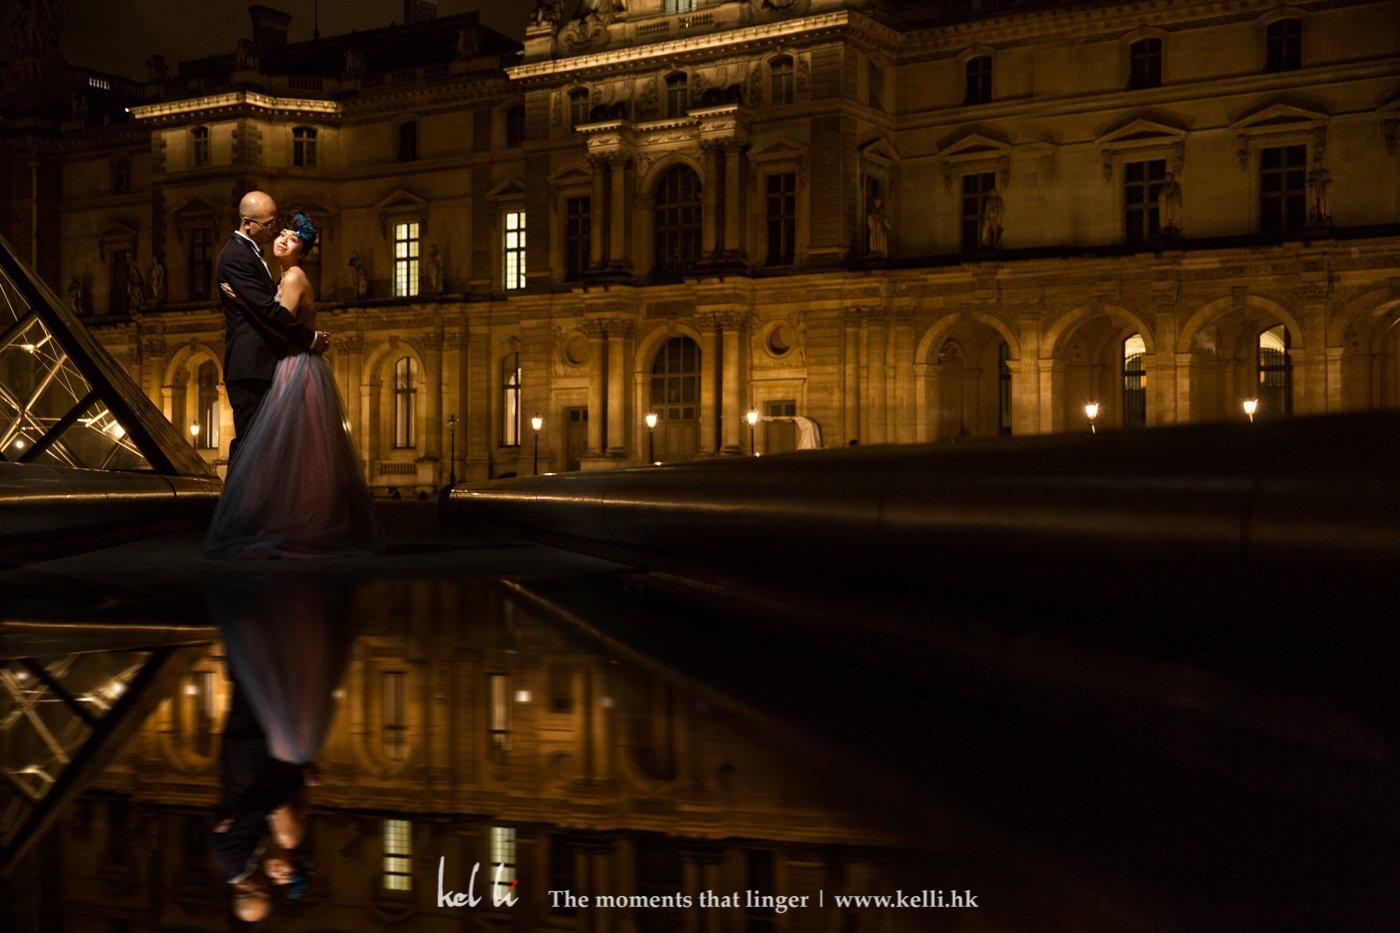 愛在巴黎, 婚紗攝影匯集 | Love in Paris, the collection